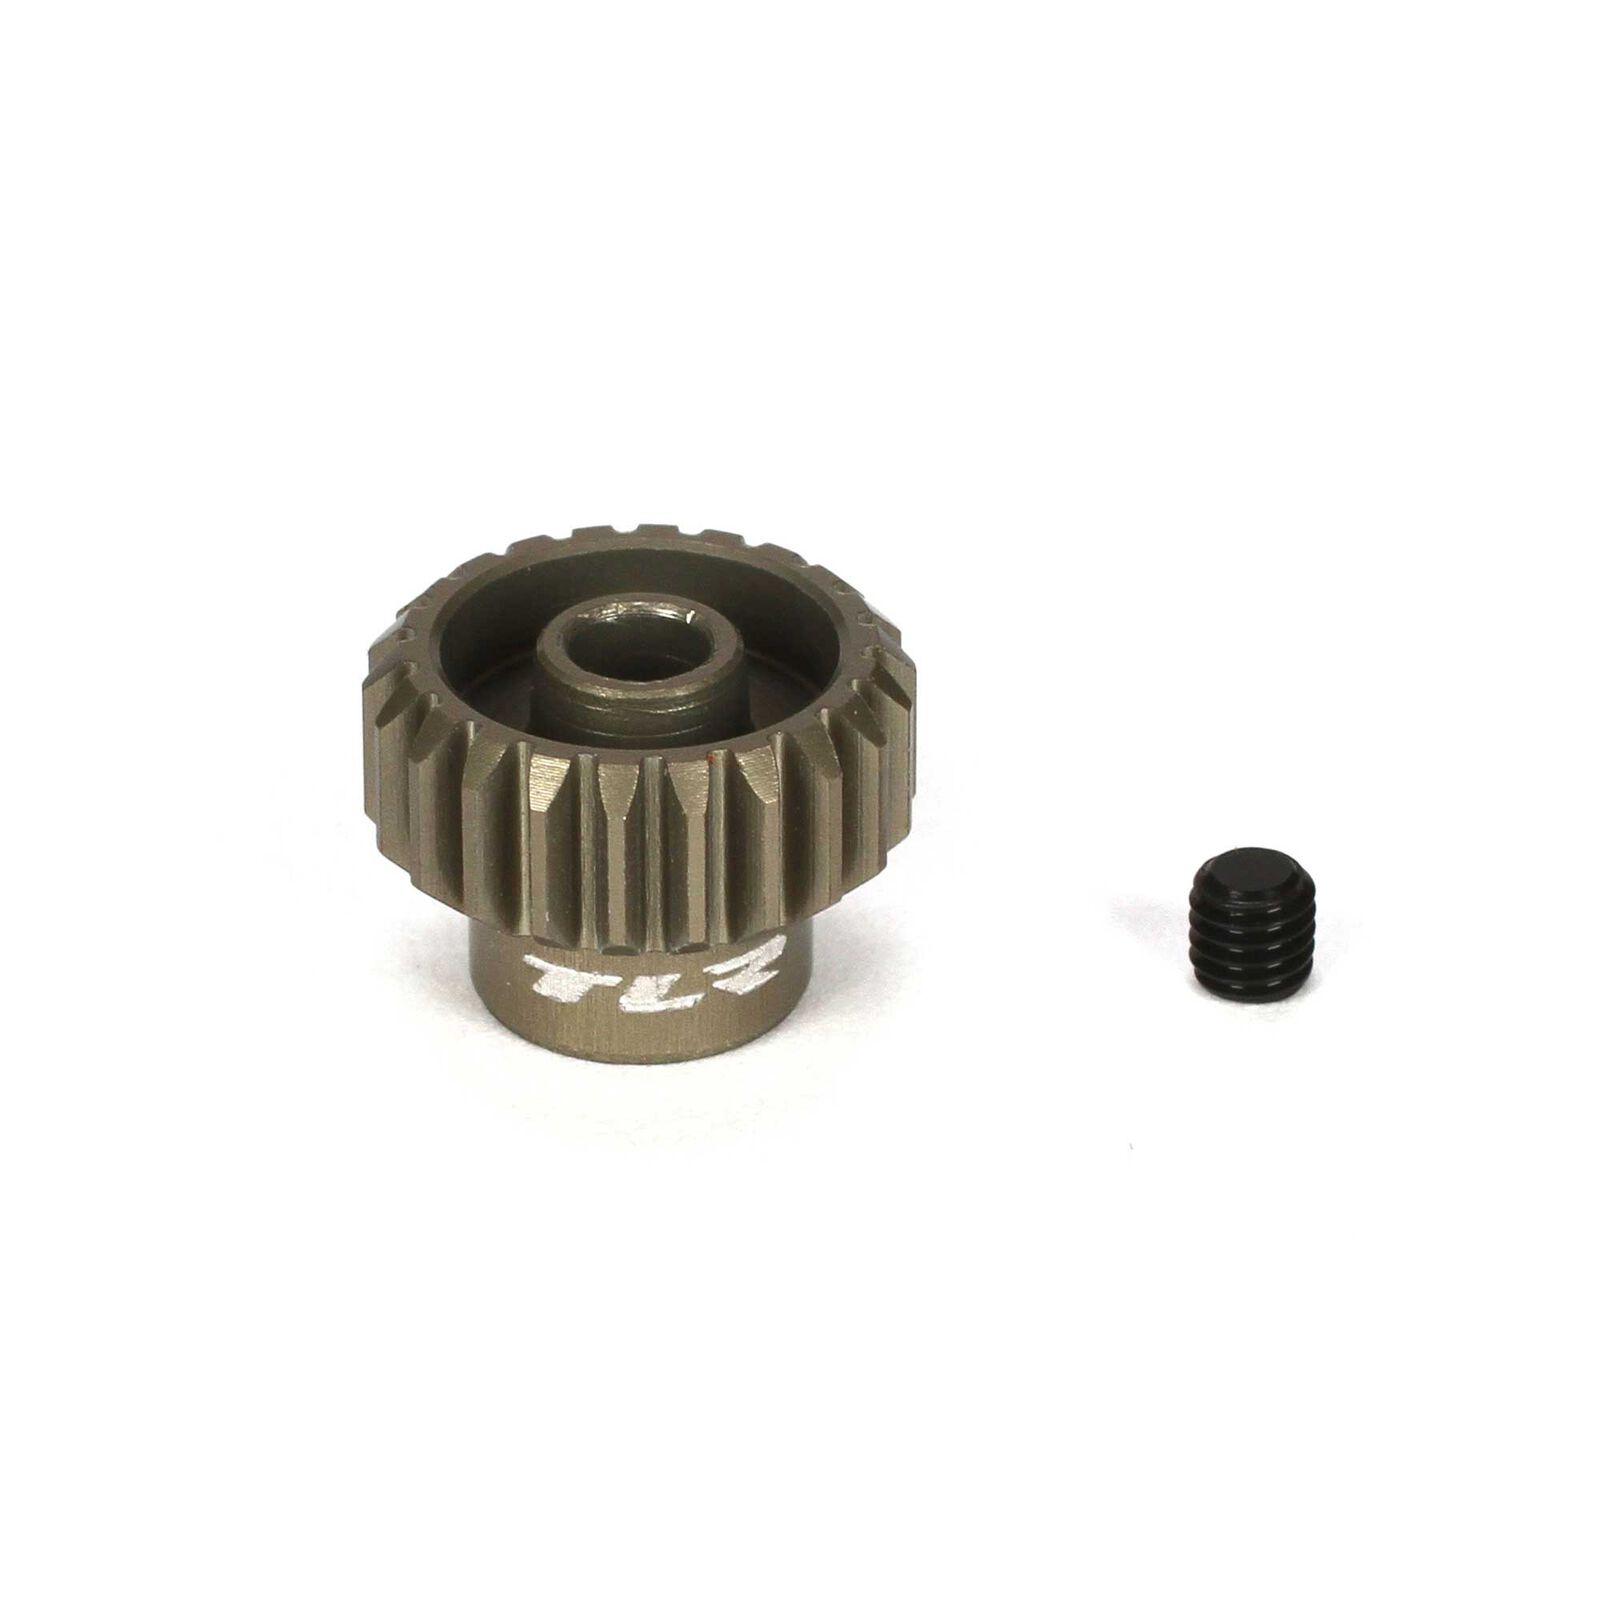 48P Aluminum Pinion Gear, 22T